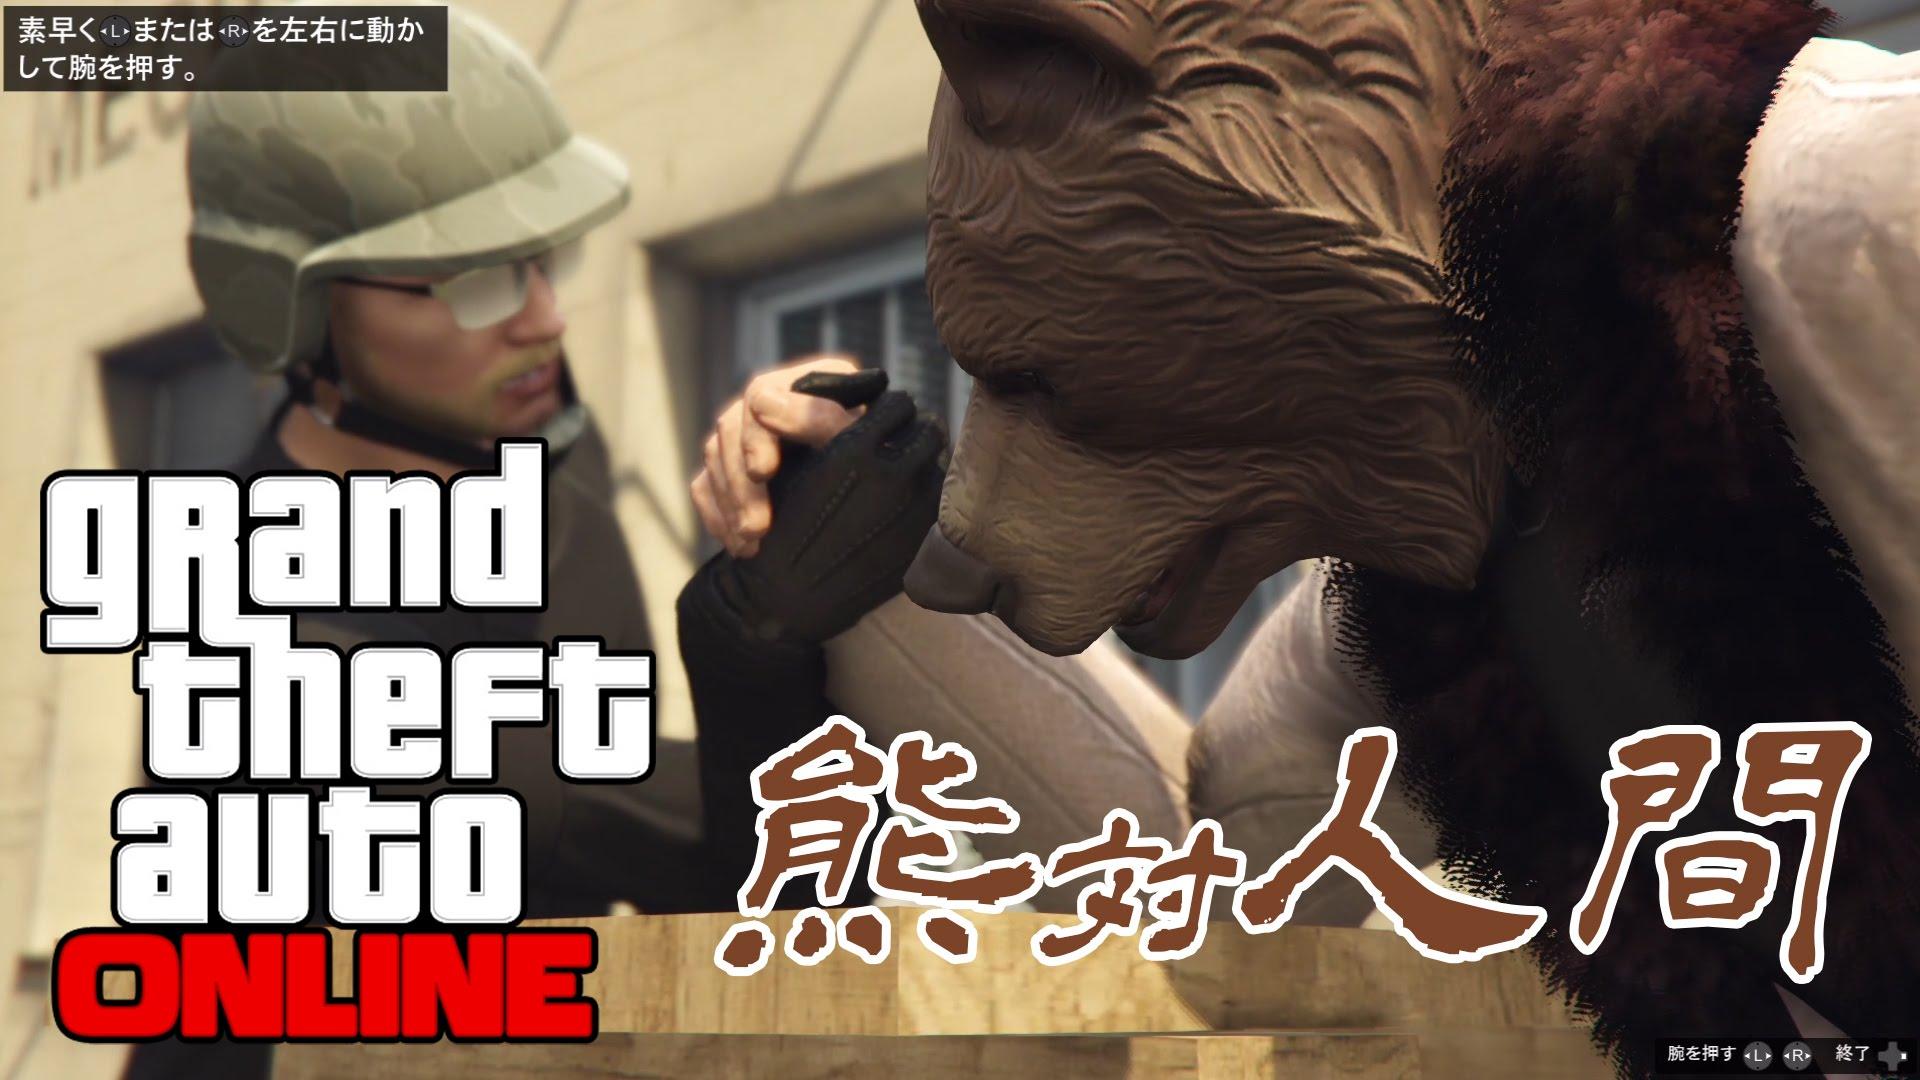 【PC版GTA Online】プレイ記録【熊vs人間】